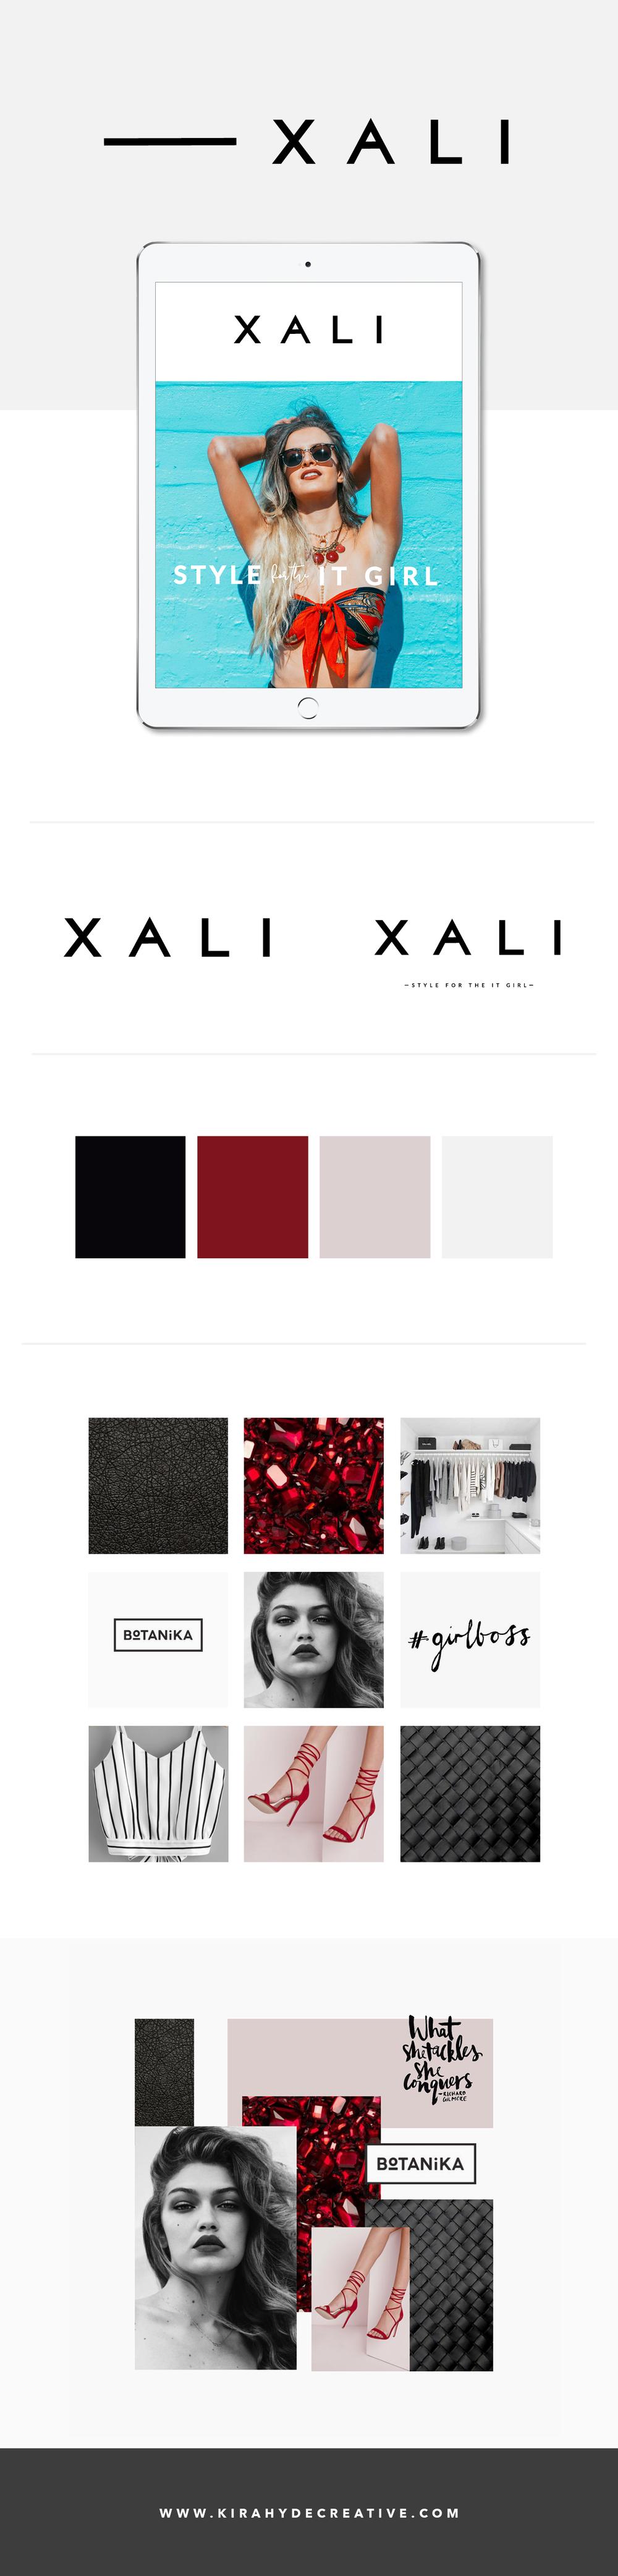 Xali - Brand Board - Kira Hyde Creative